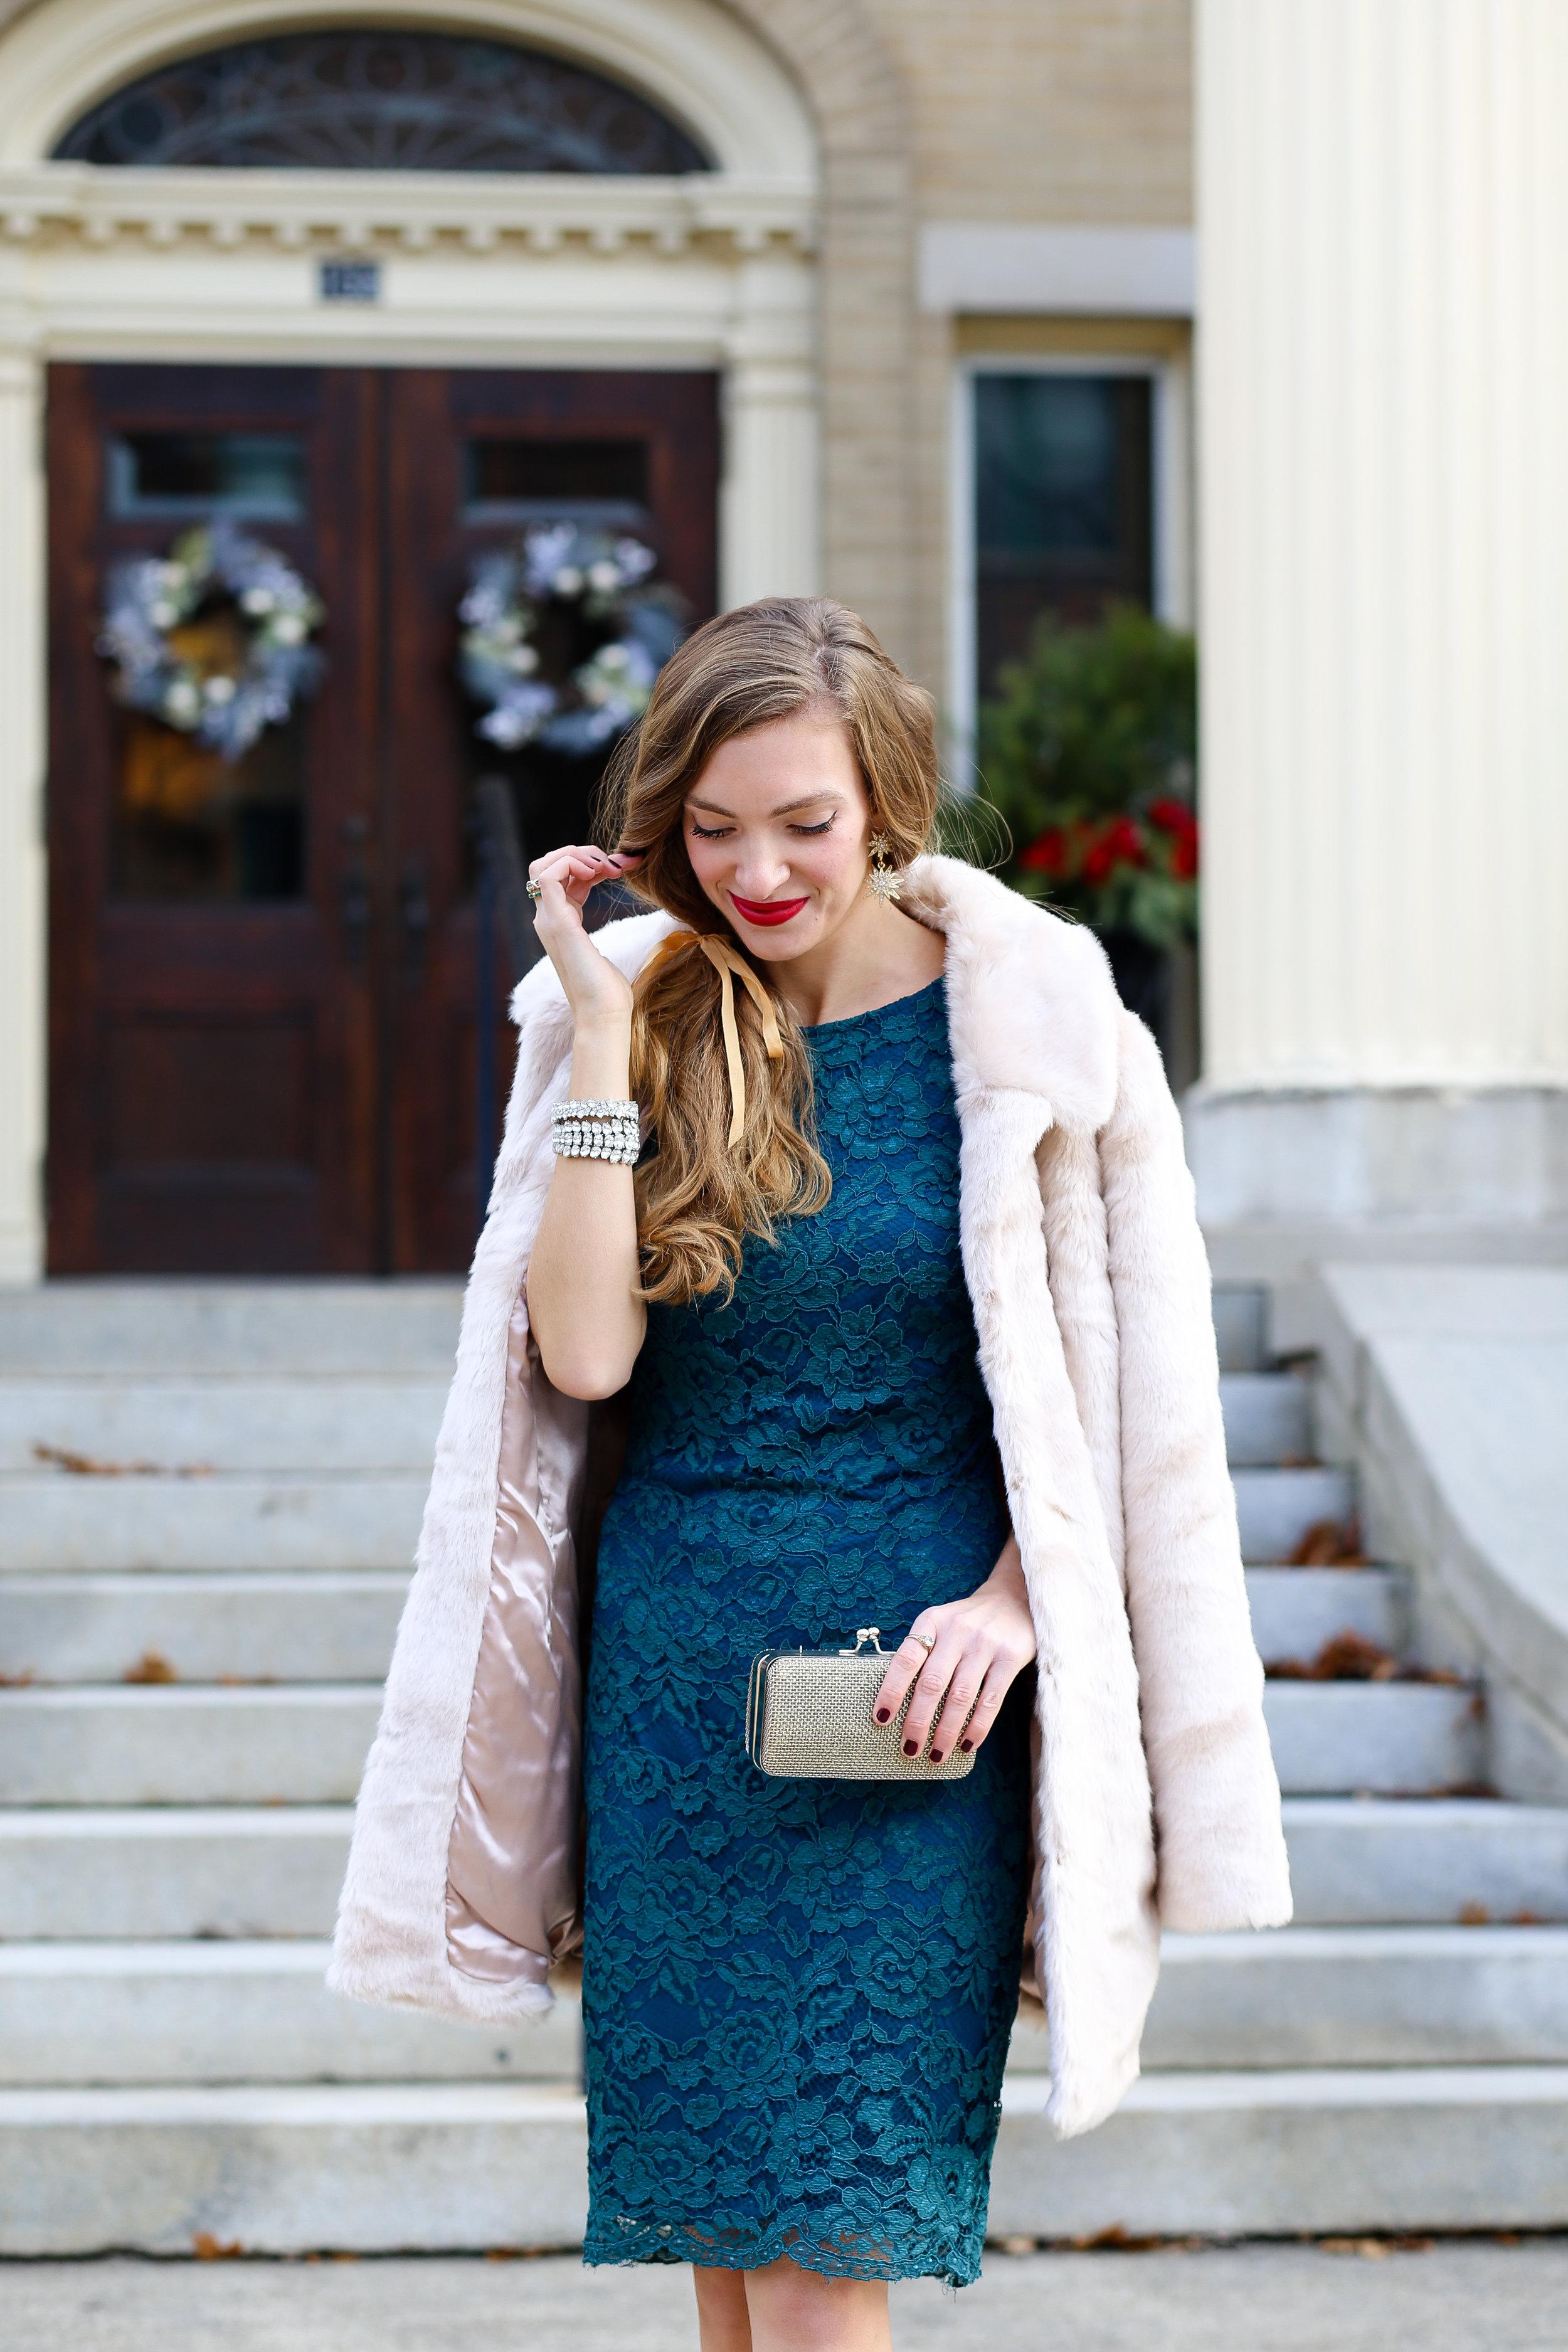 The Green Dress- Enchanting Elegance